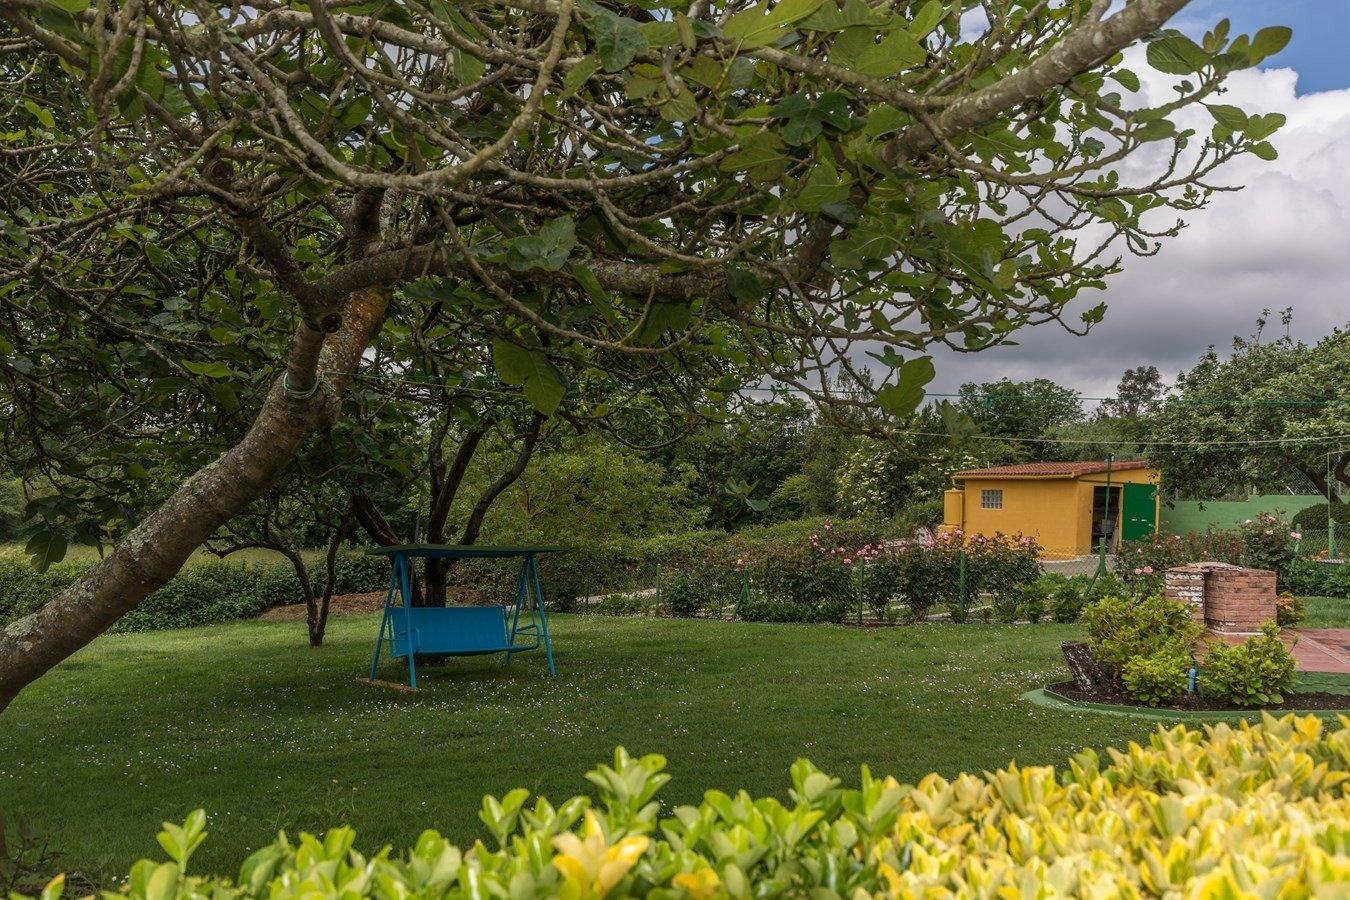 Maravillosa propiedad en orviz. siero - imagenInmueble16